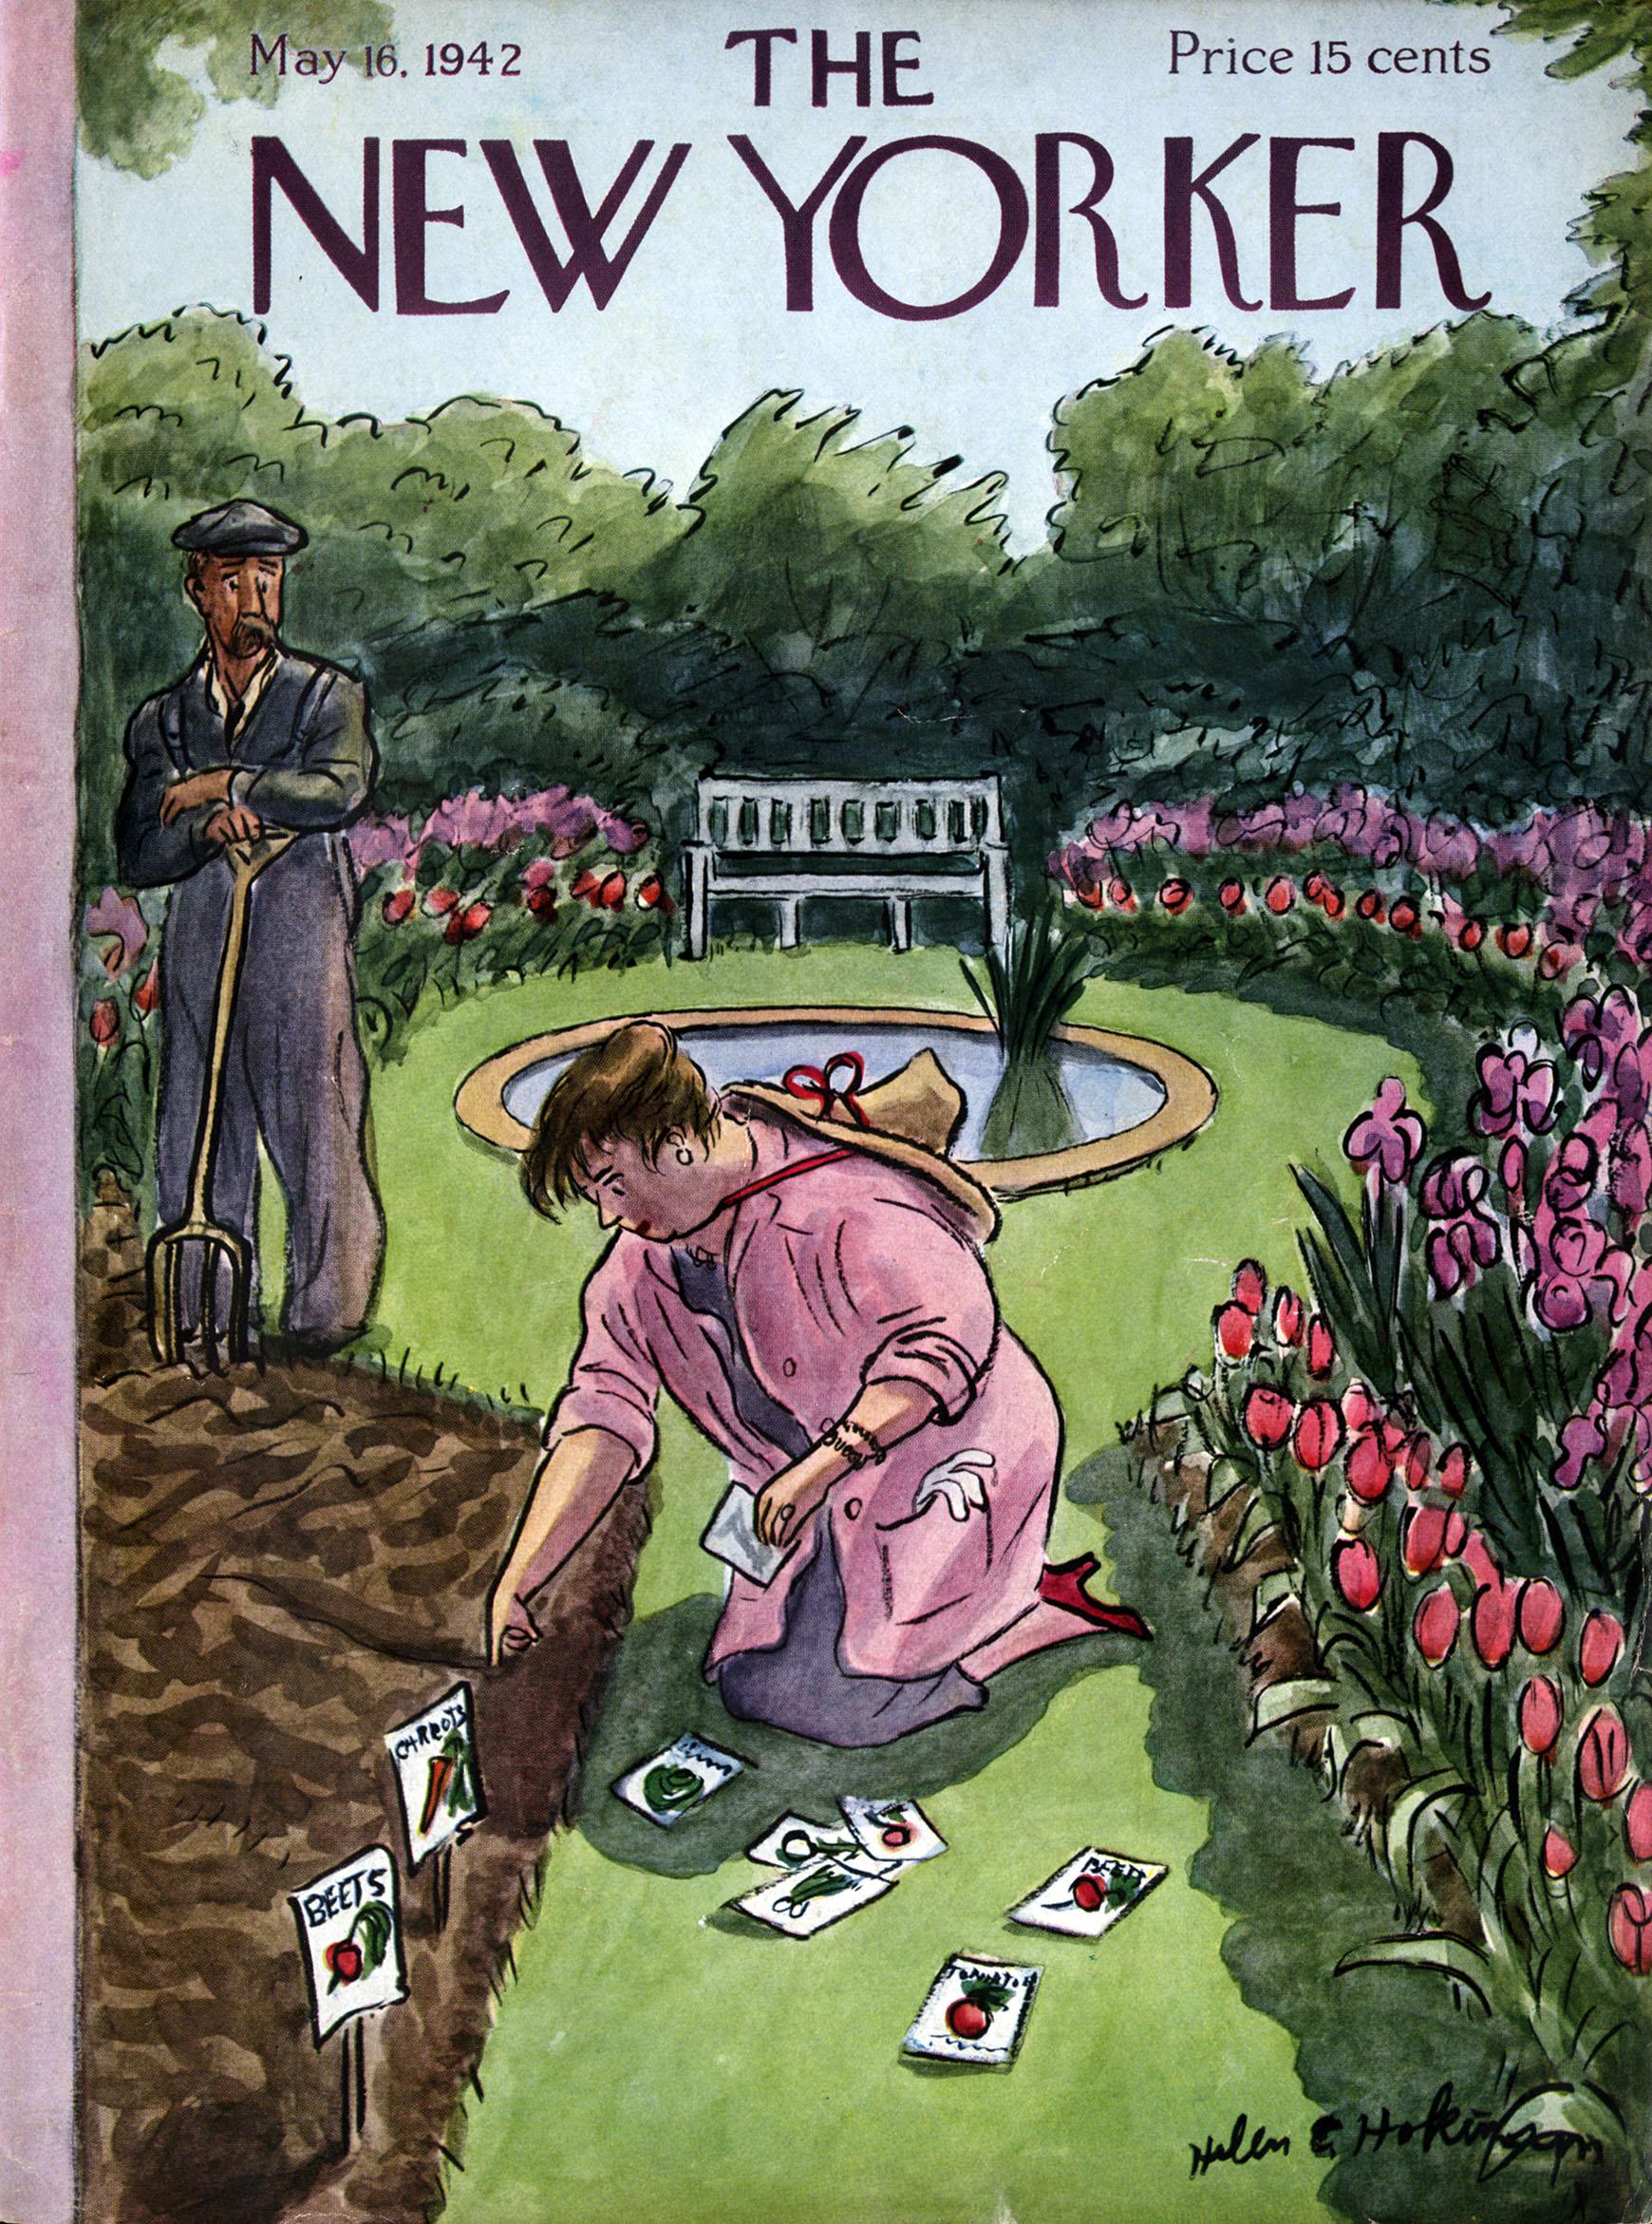 Helen E. Hokinson, Cover Illustration for  The New Yorker . May16, 1942.